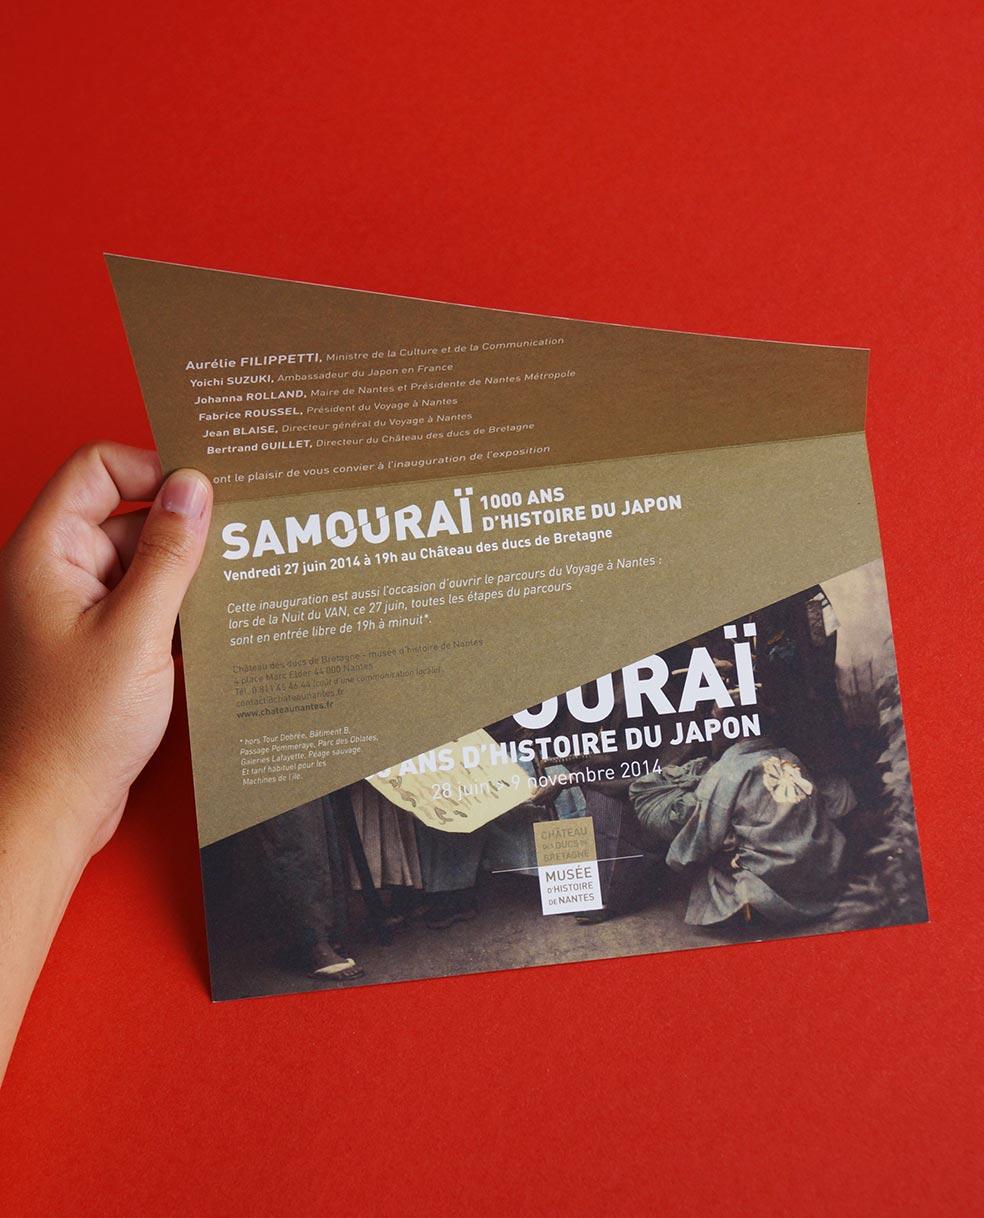 Communication Exposition Samourai chateau nantes